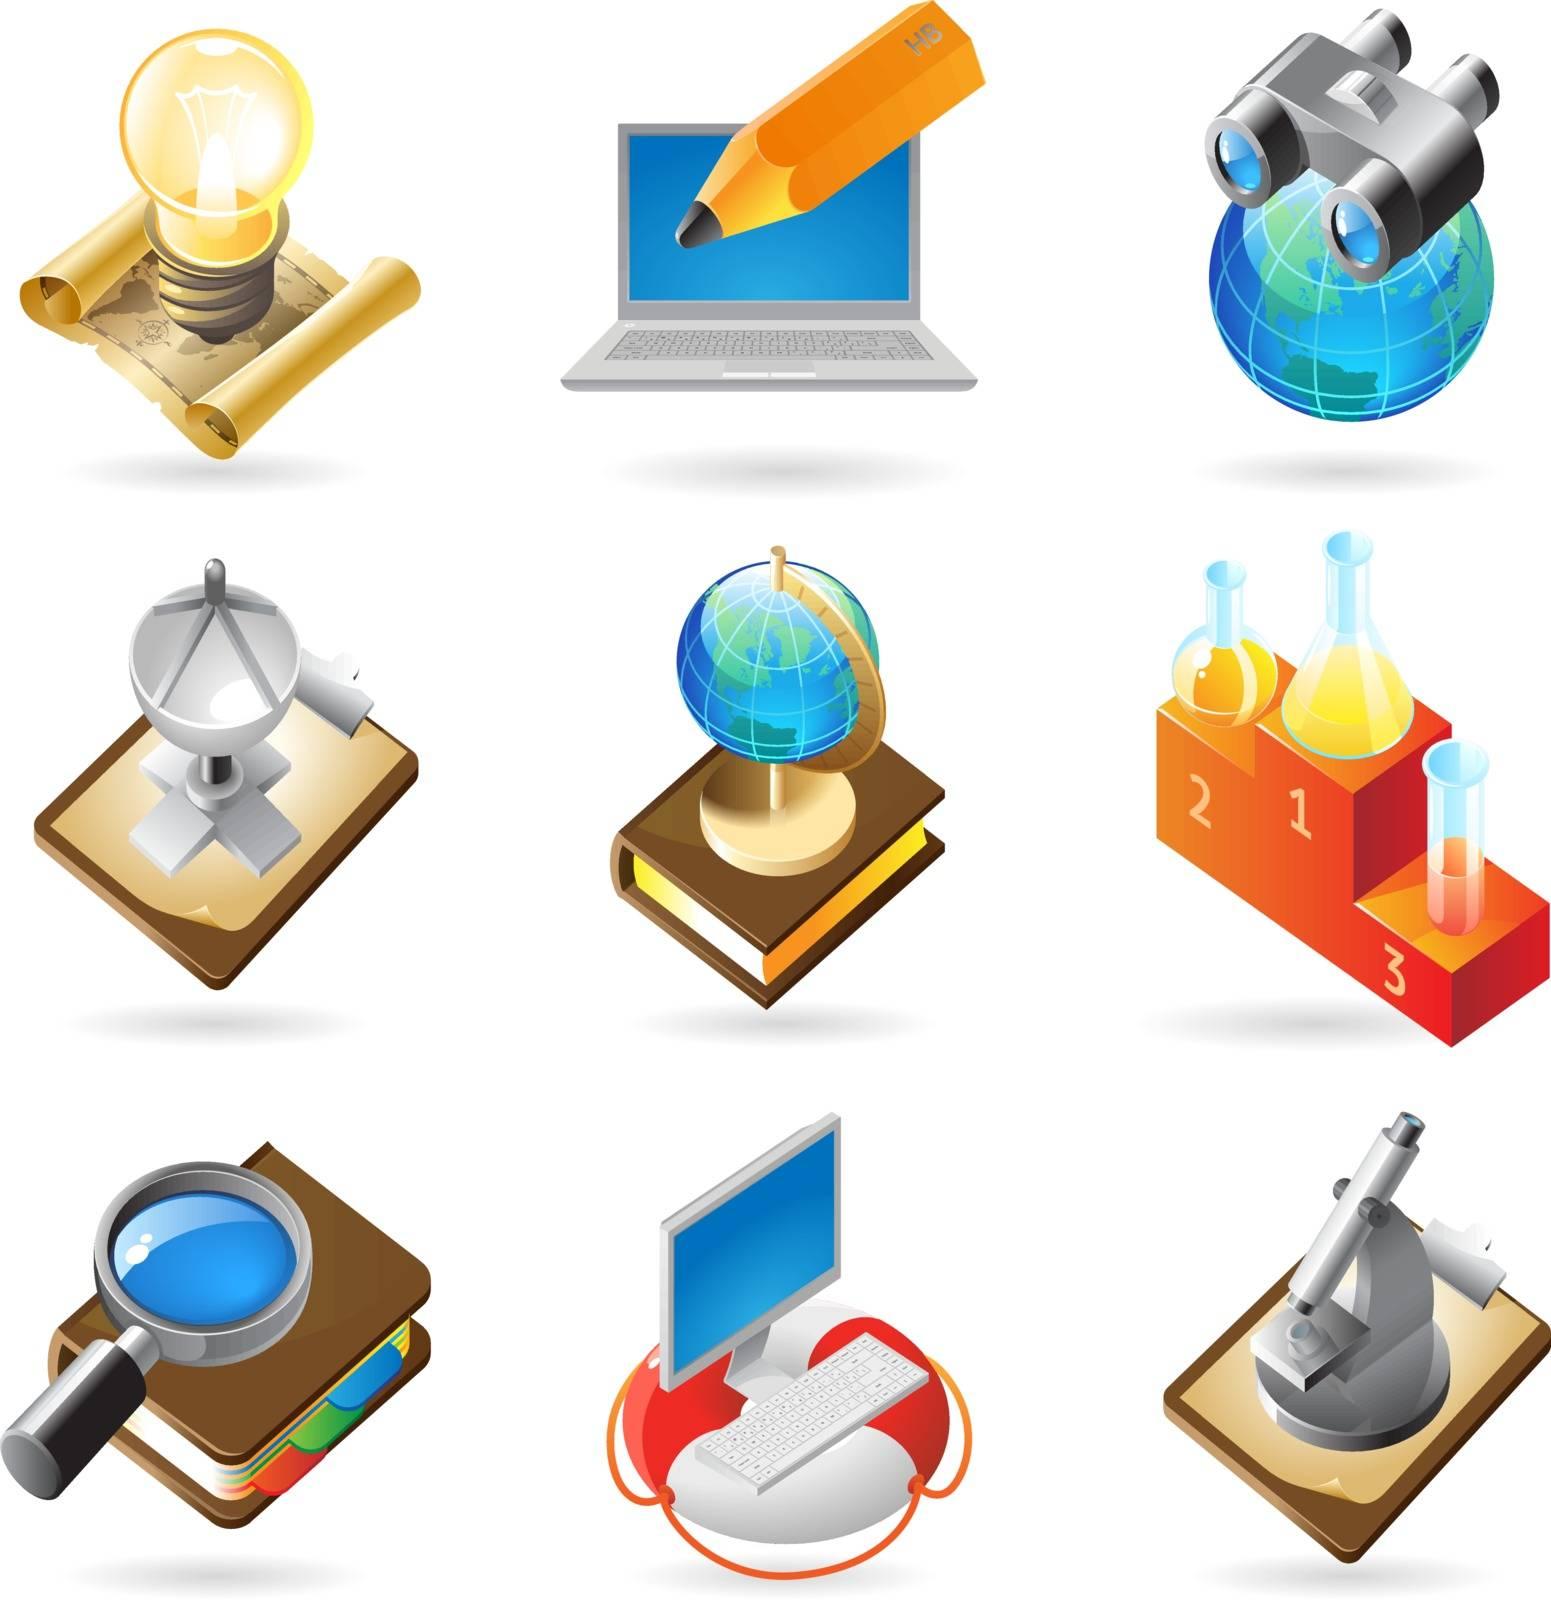 Icon concepts for science by ildogesto